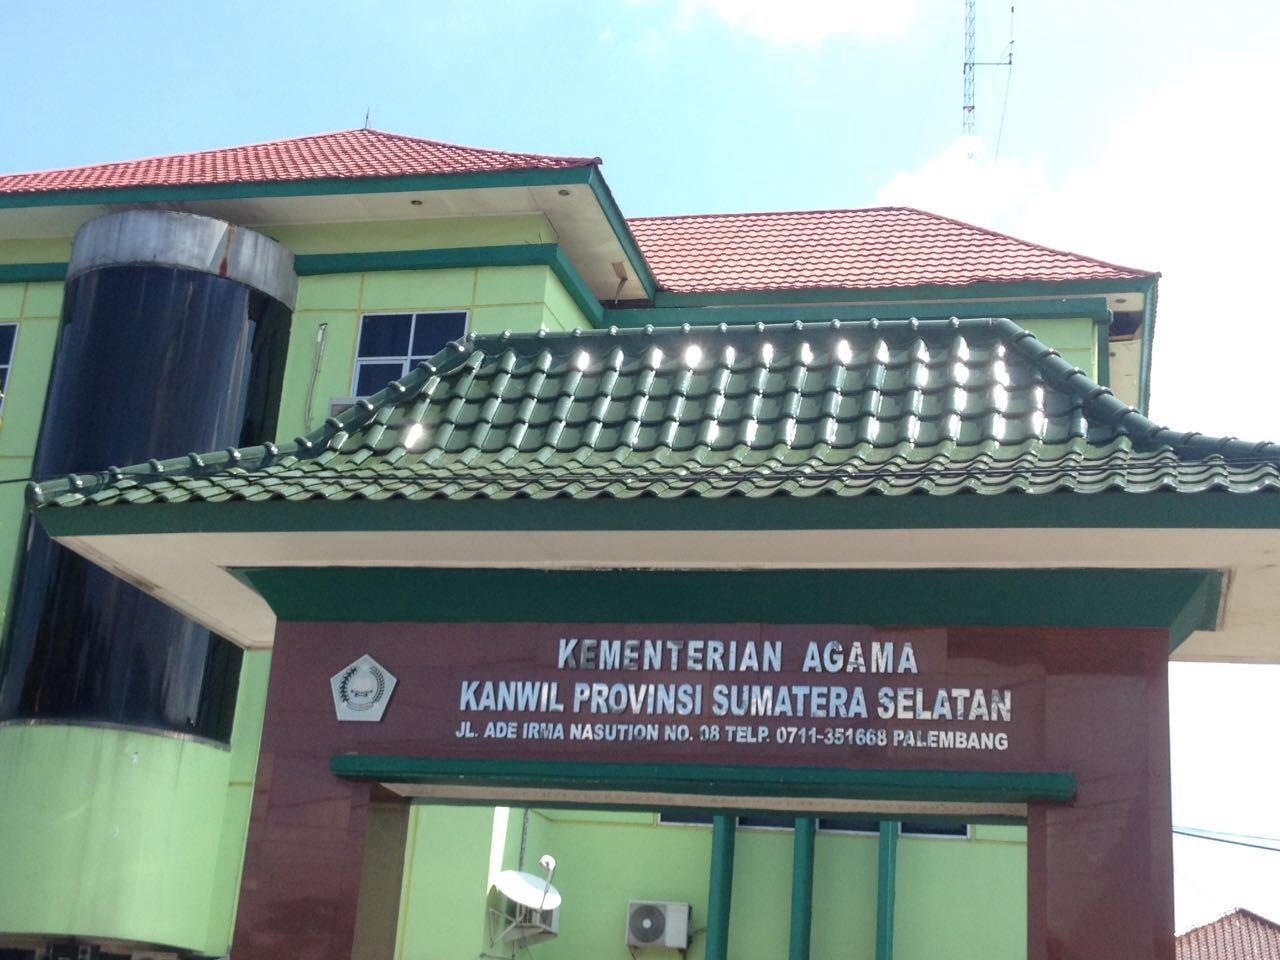 Alamat Lengkap dan Nomor Telepon Kementerian  Agama Se-Provinsi Sumatera Selatan